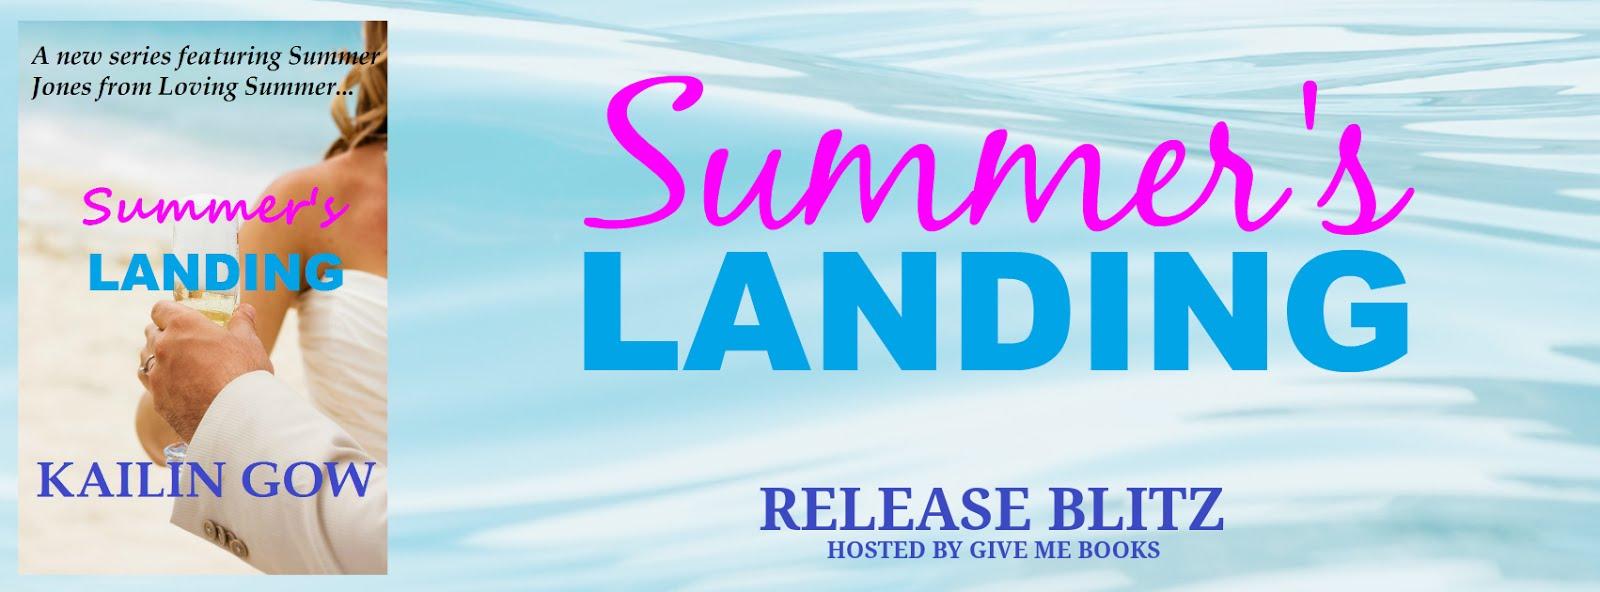 Summer's Landing Release Blitz